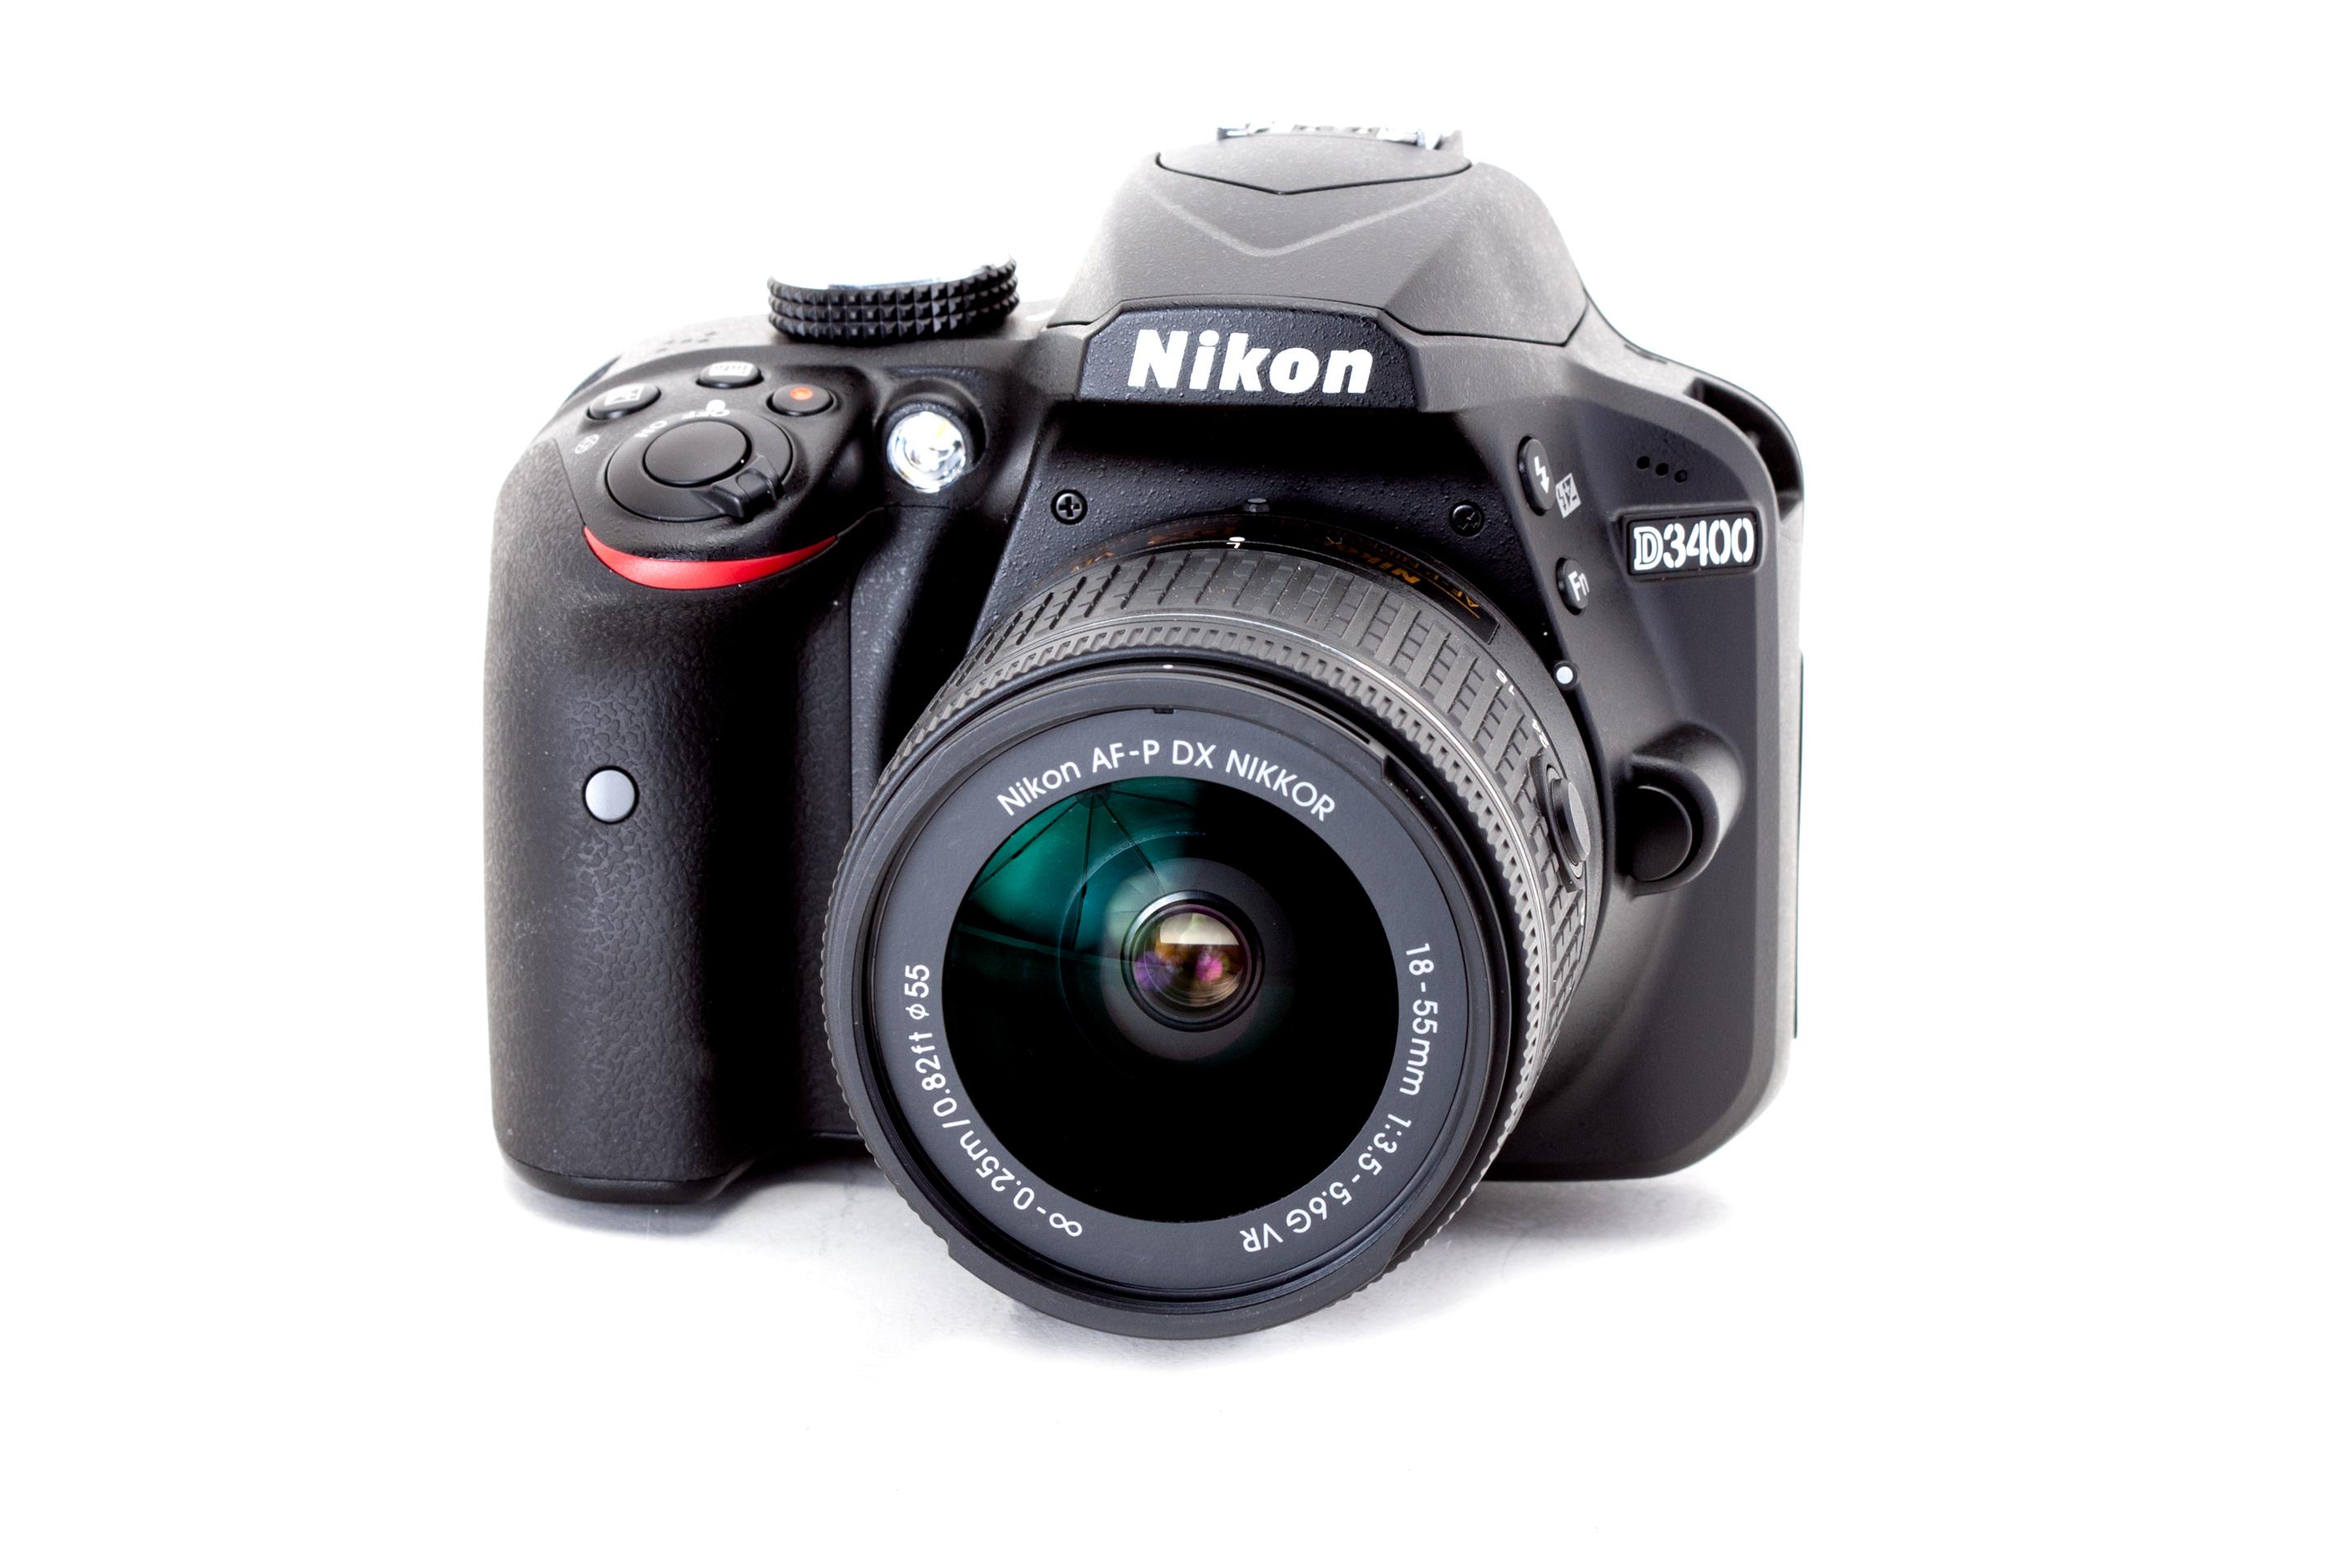 Nikon D3400 Review: Digital Photography Review